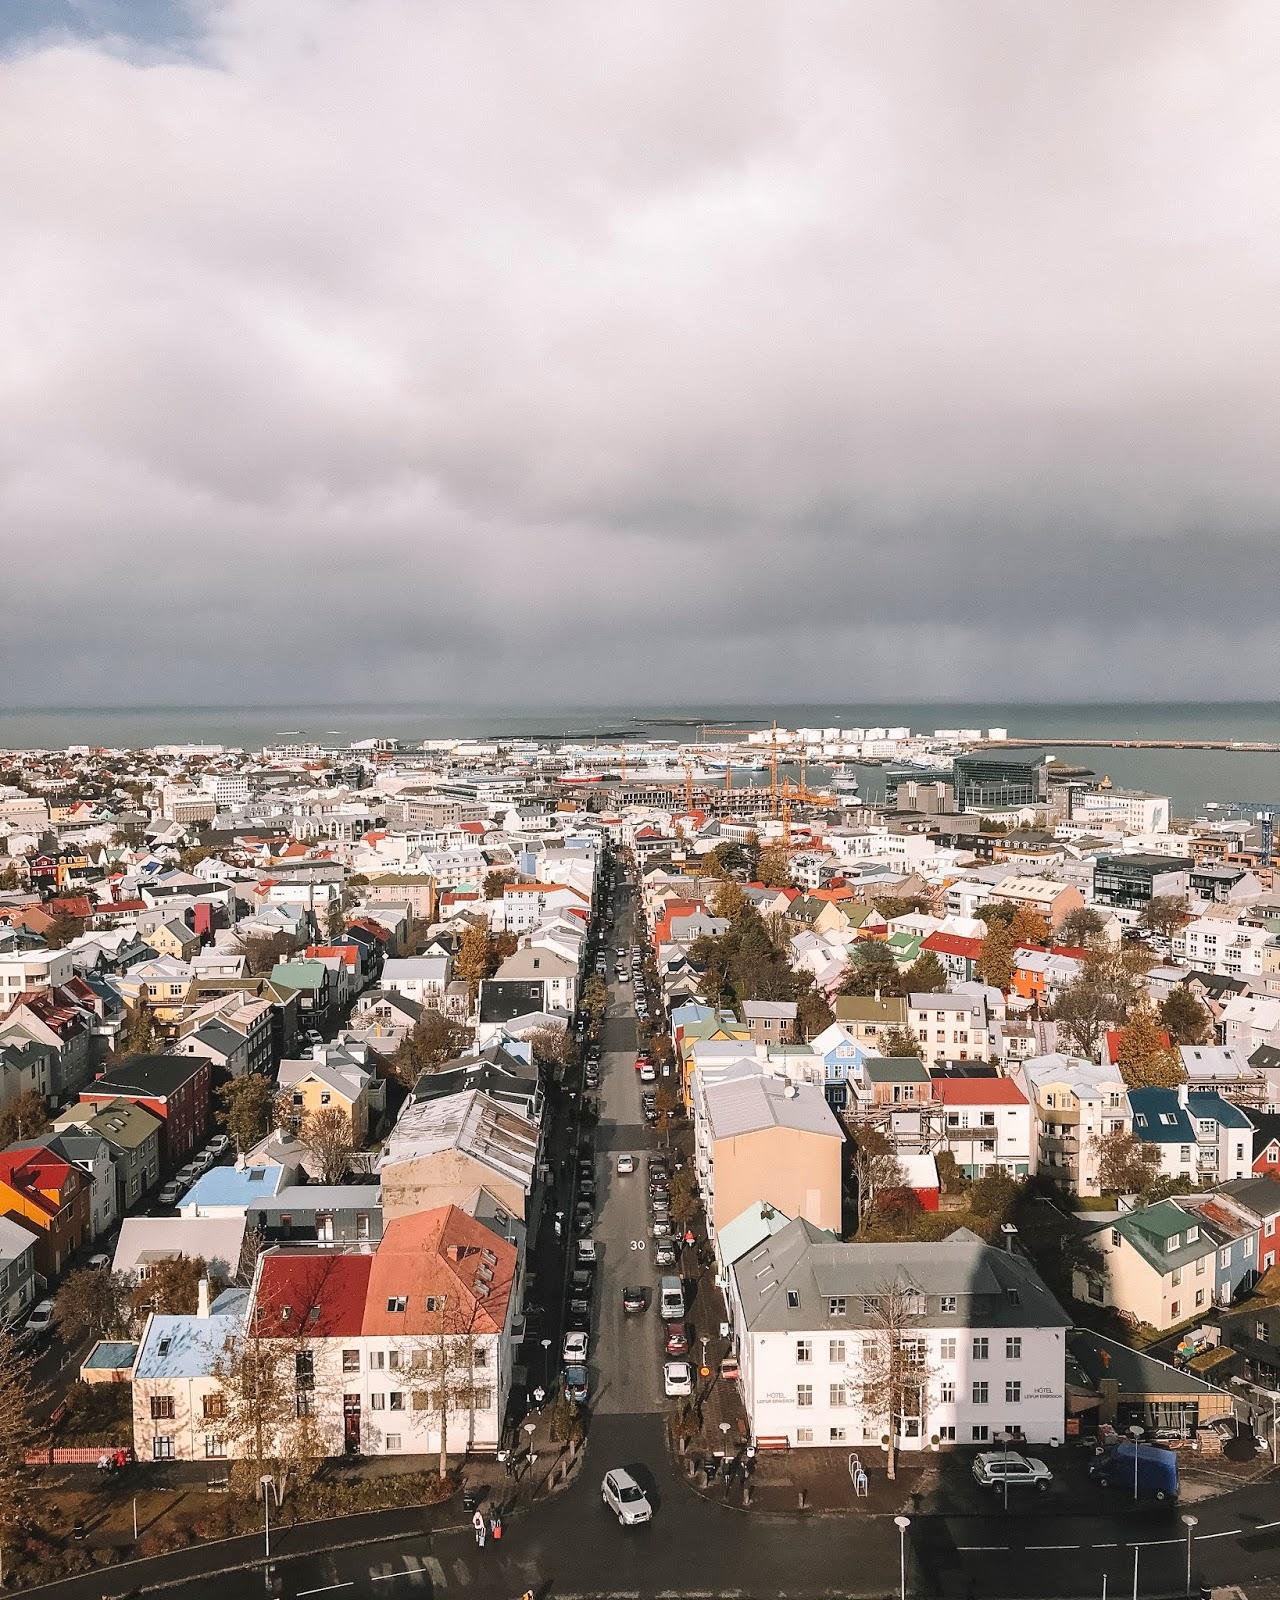 Overlooking downtown Reykjavik